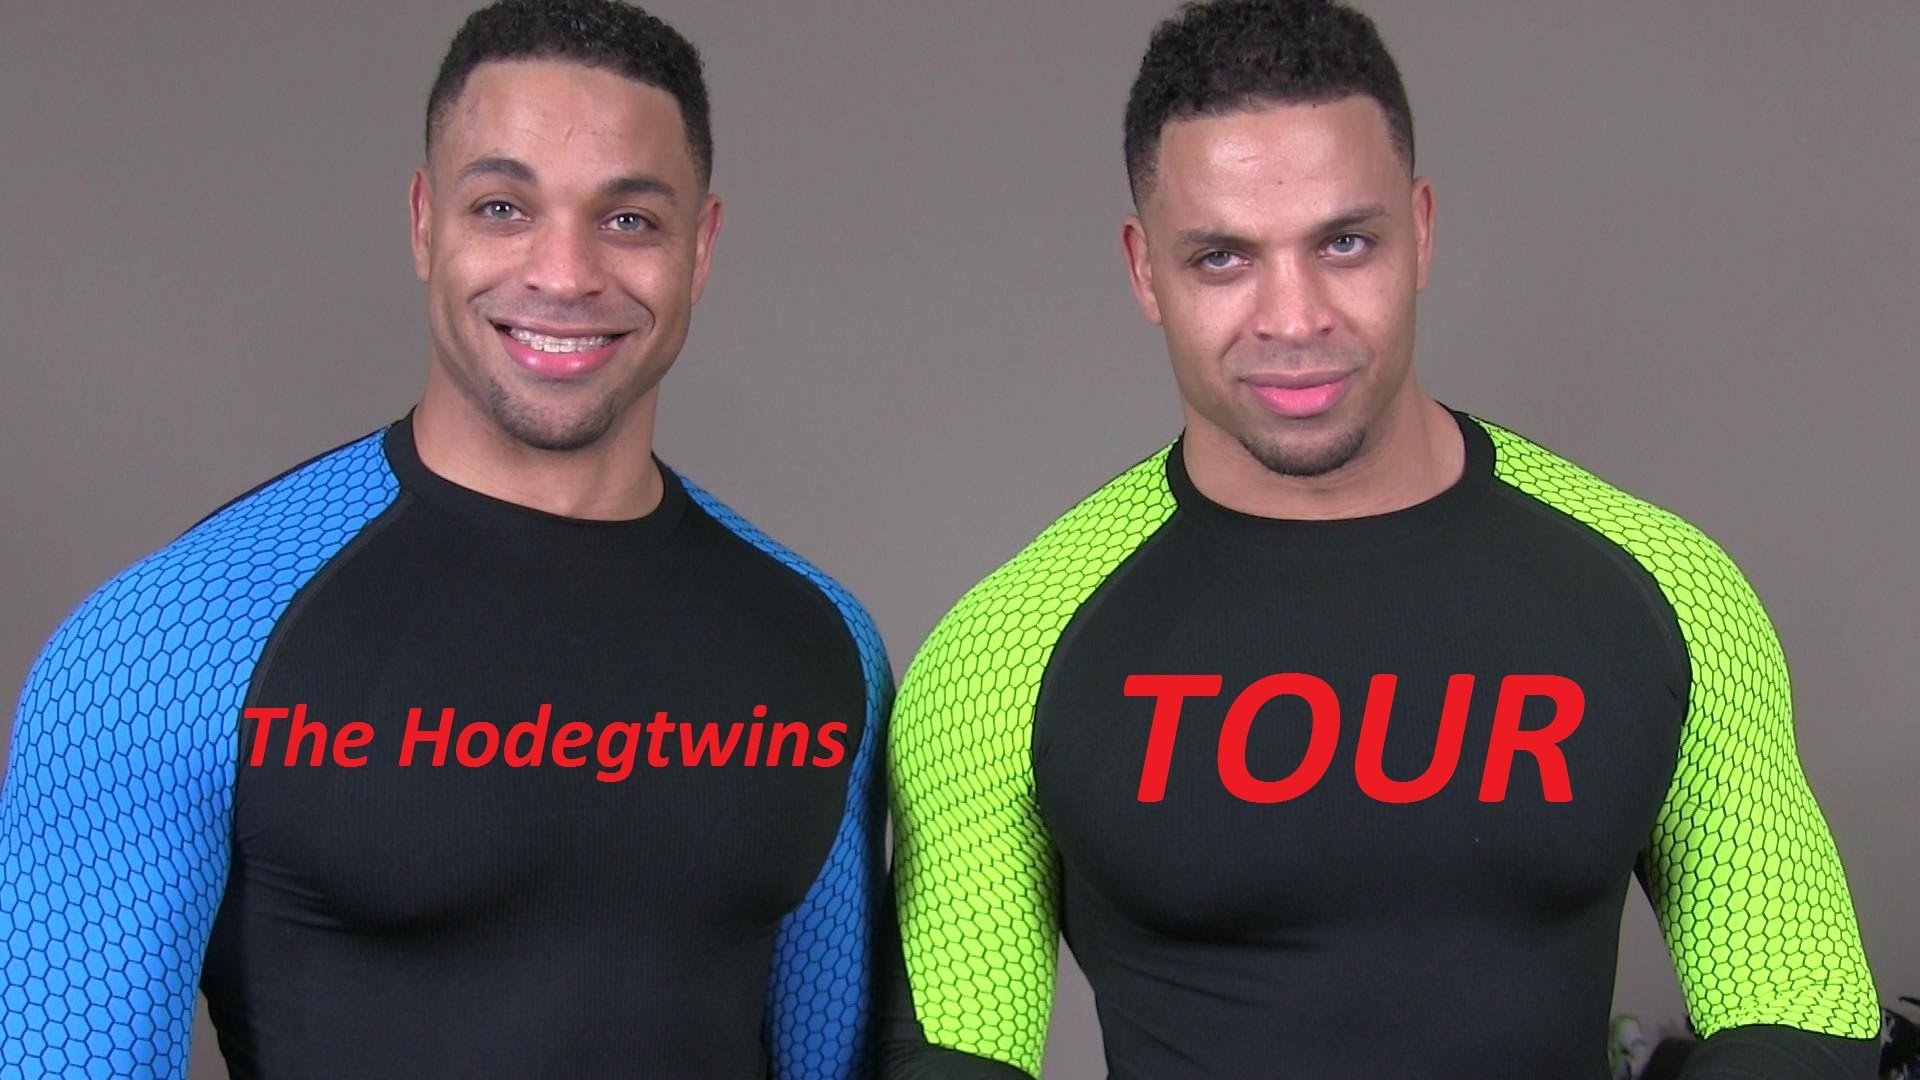 The Hodgetwins Tour